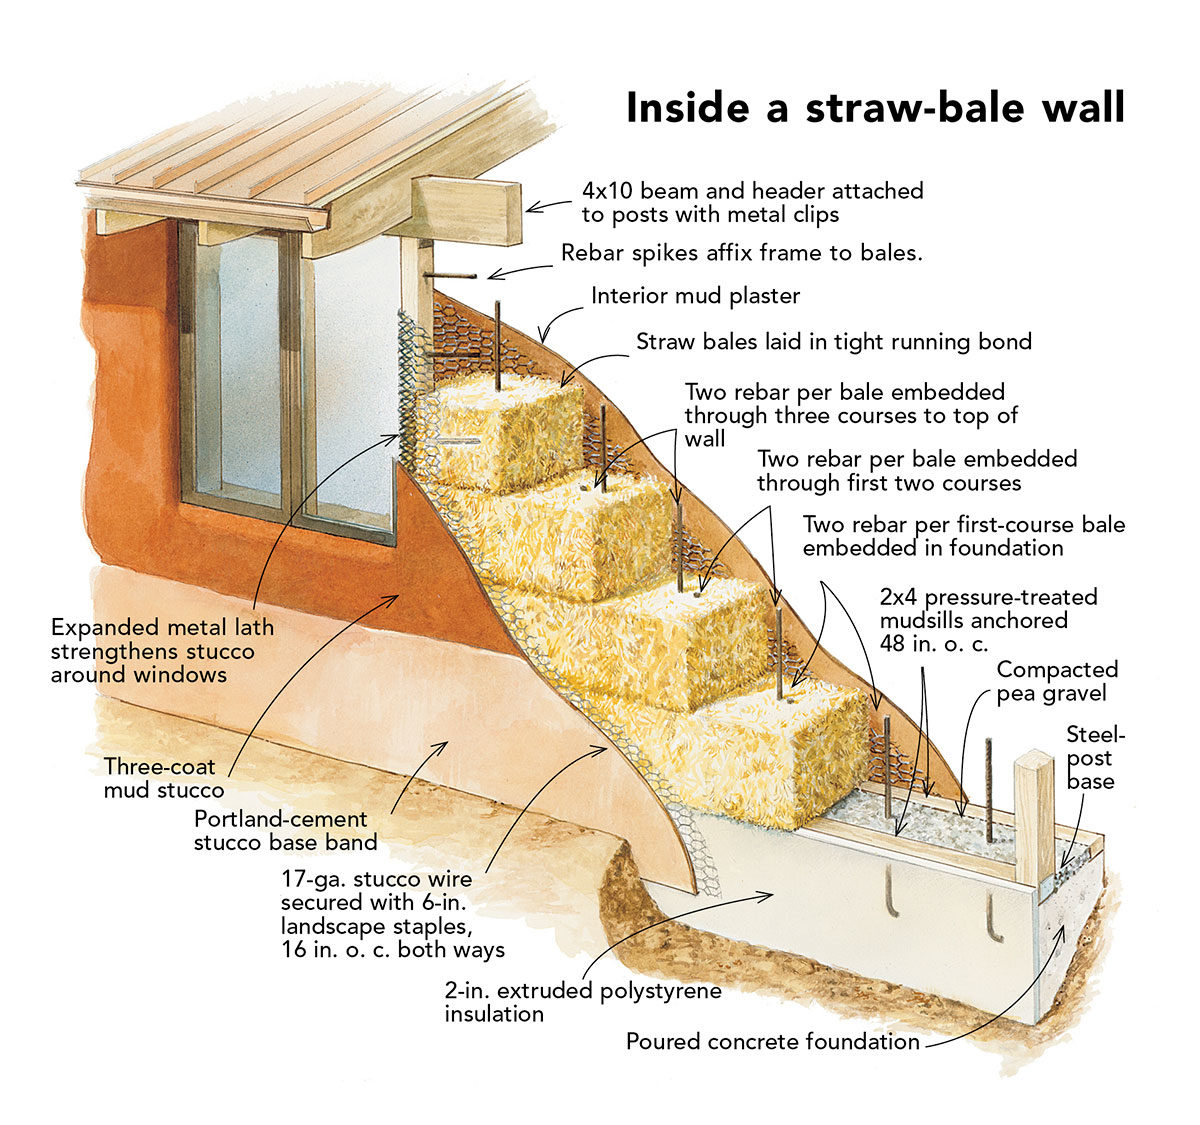 Straw-Bale construction